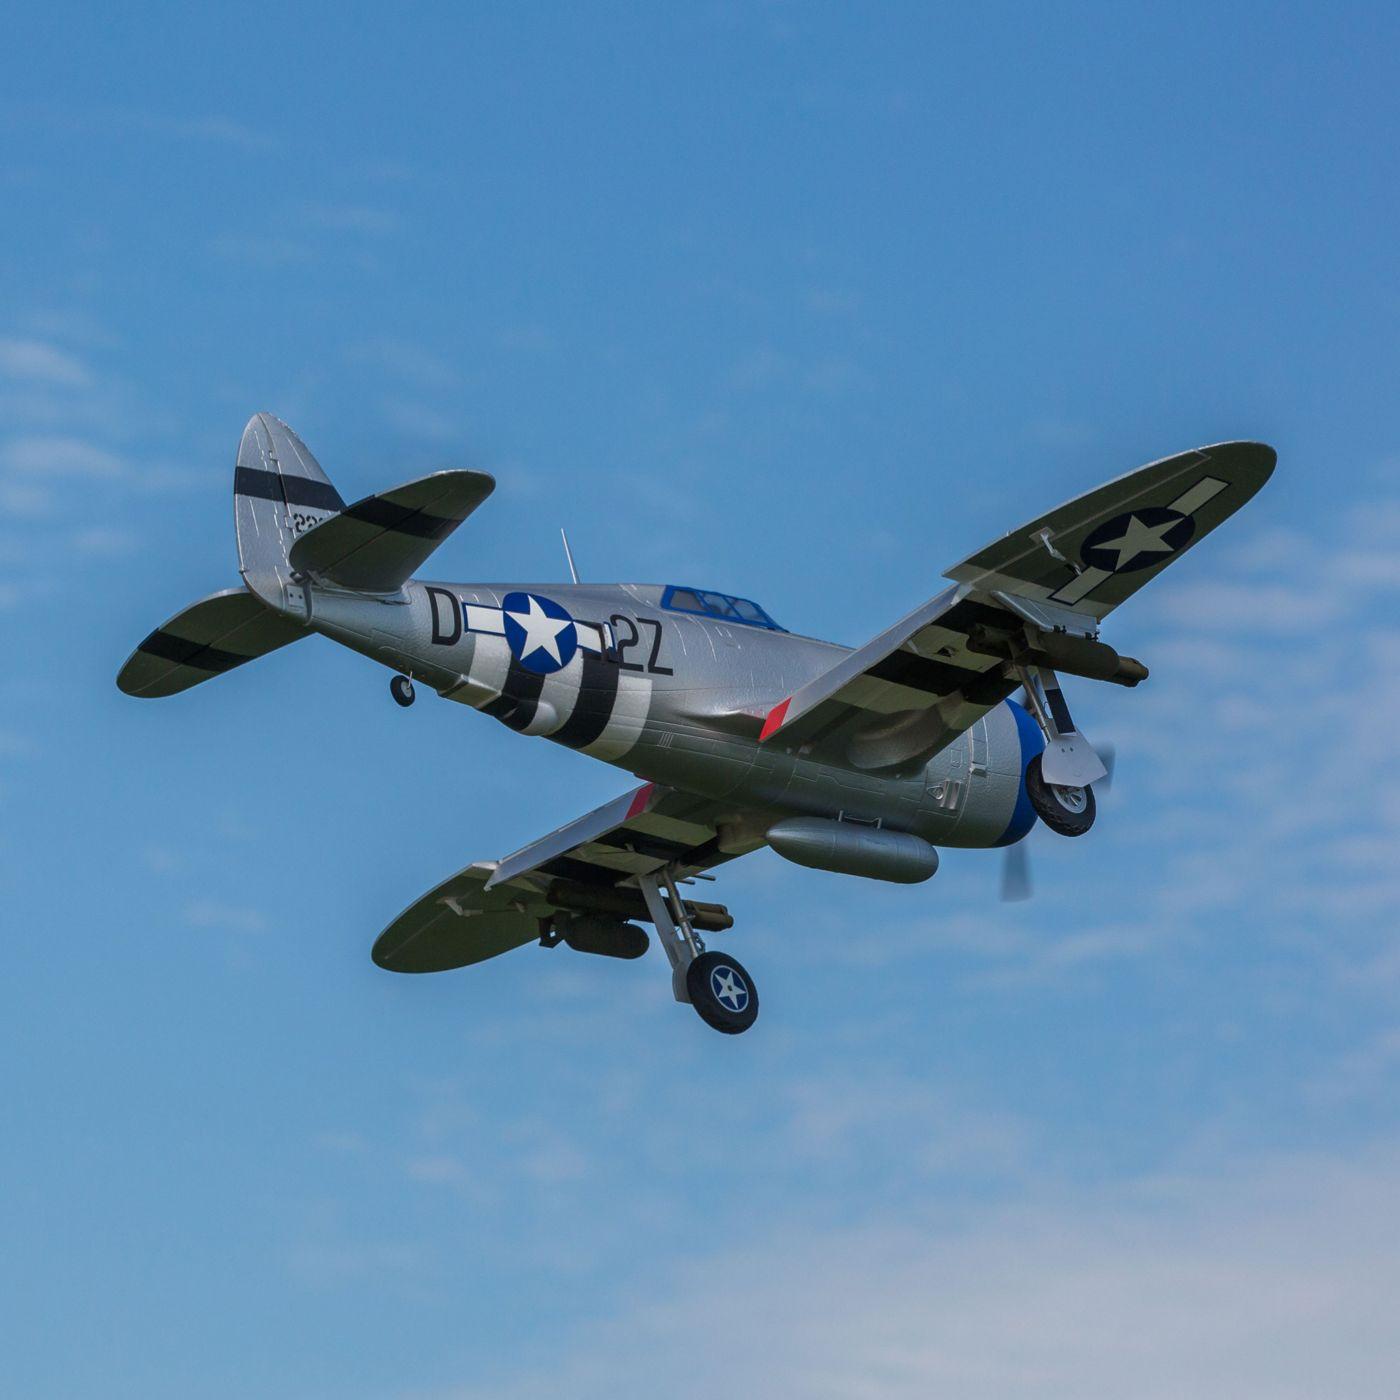 E-flite P-47 Razorback Warbird bnf basic safe 04